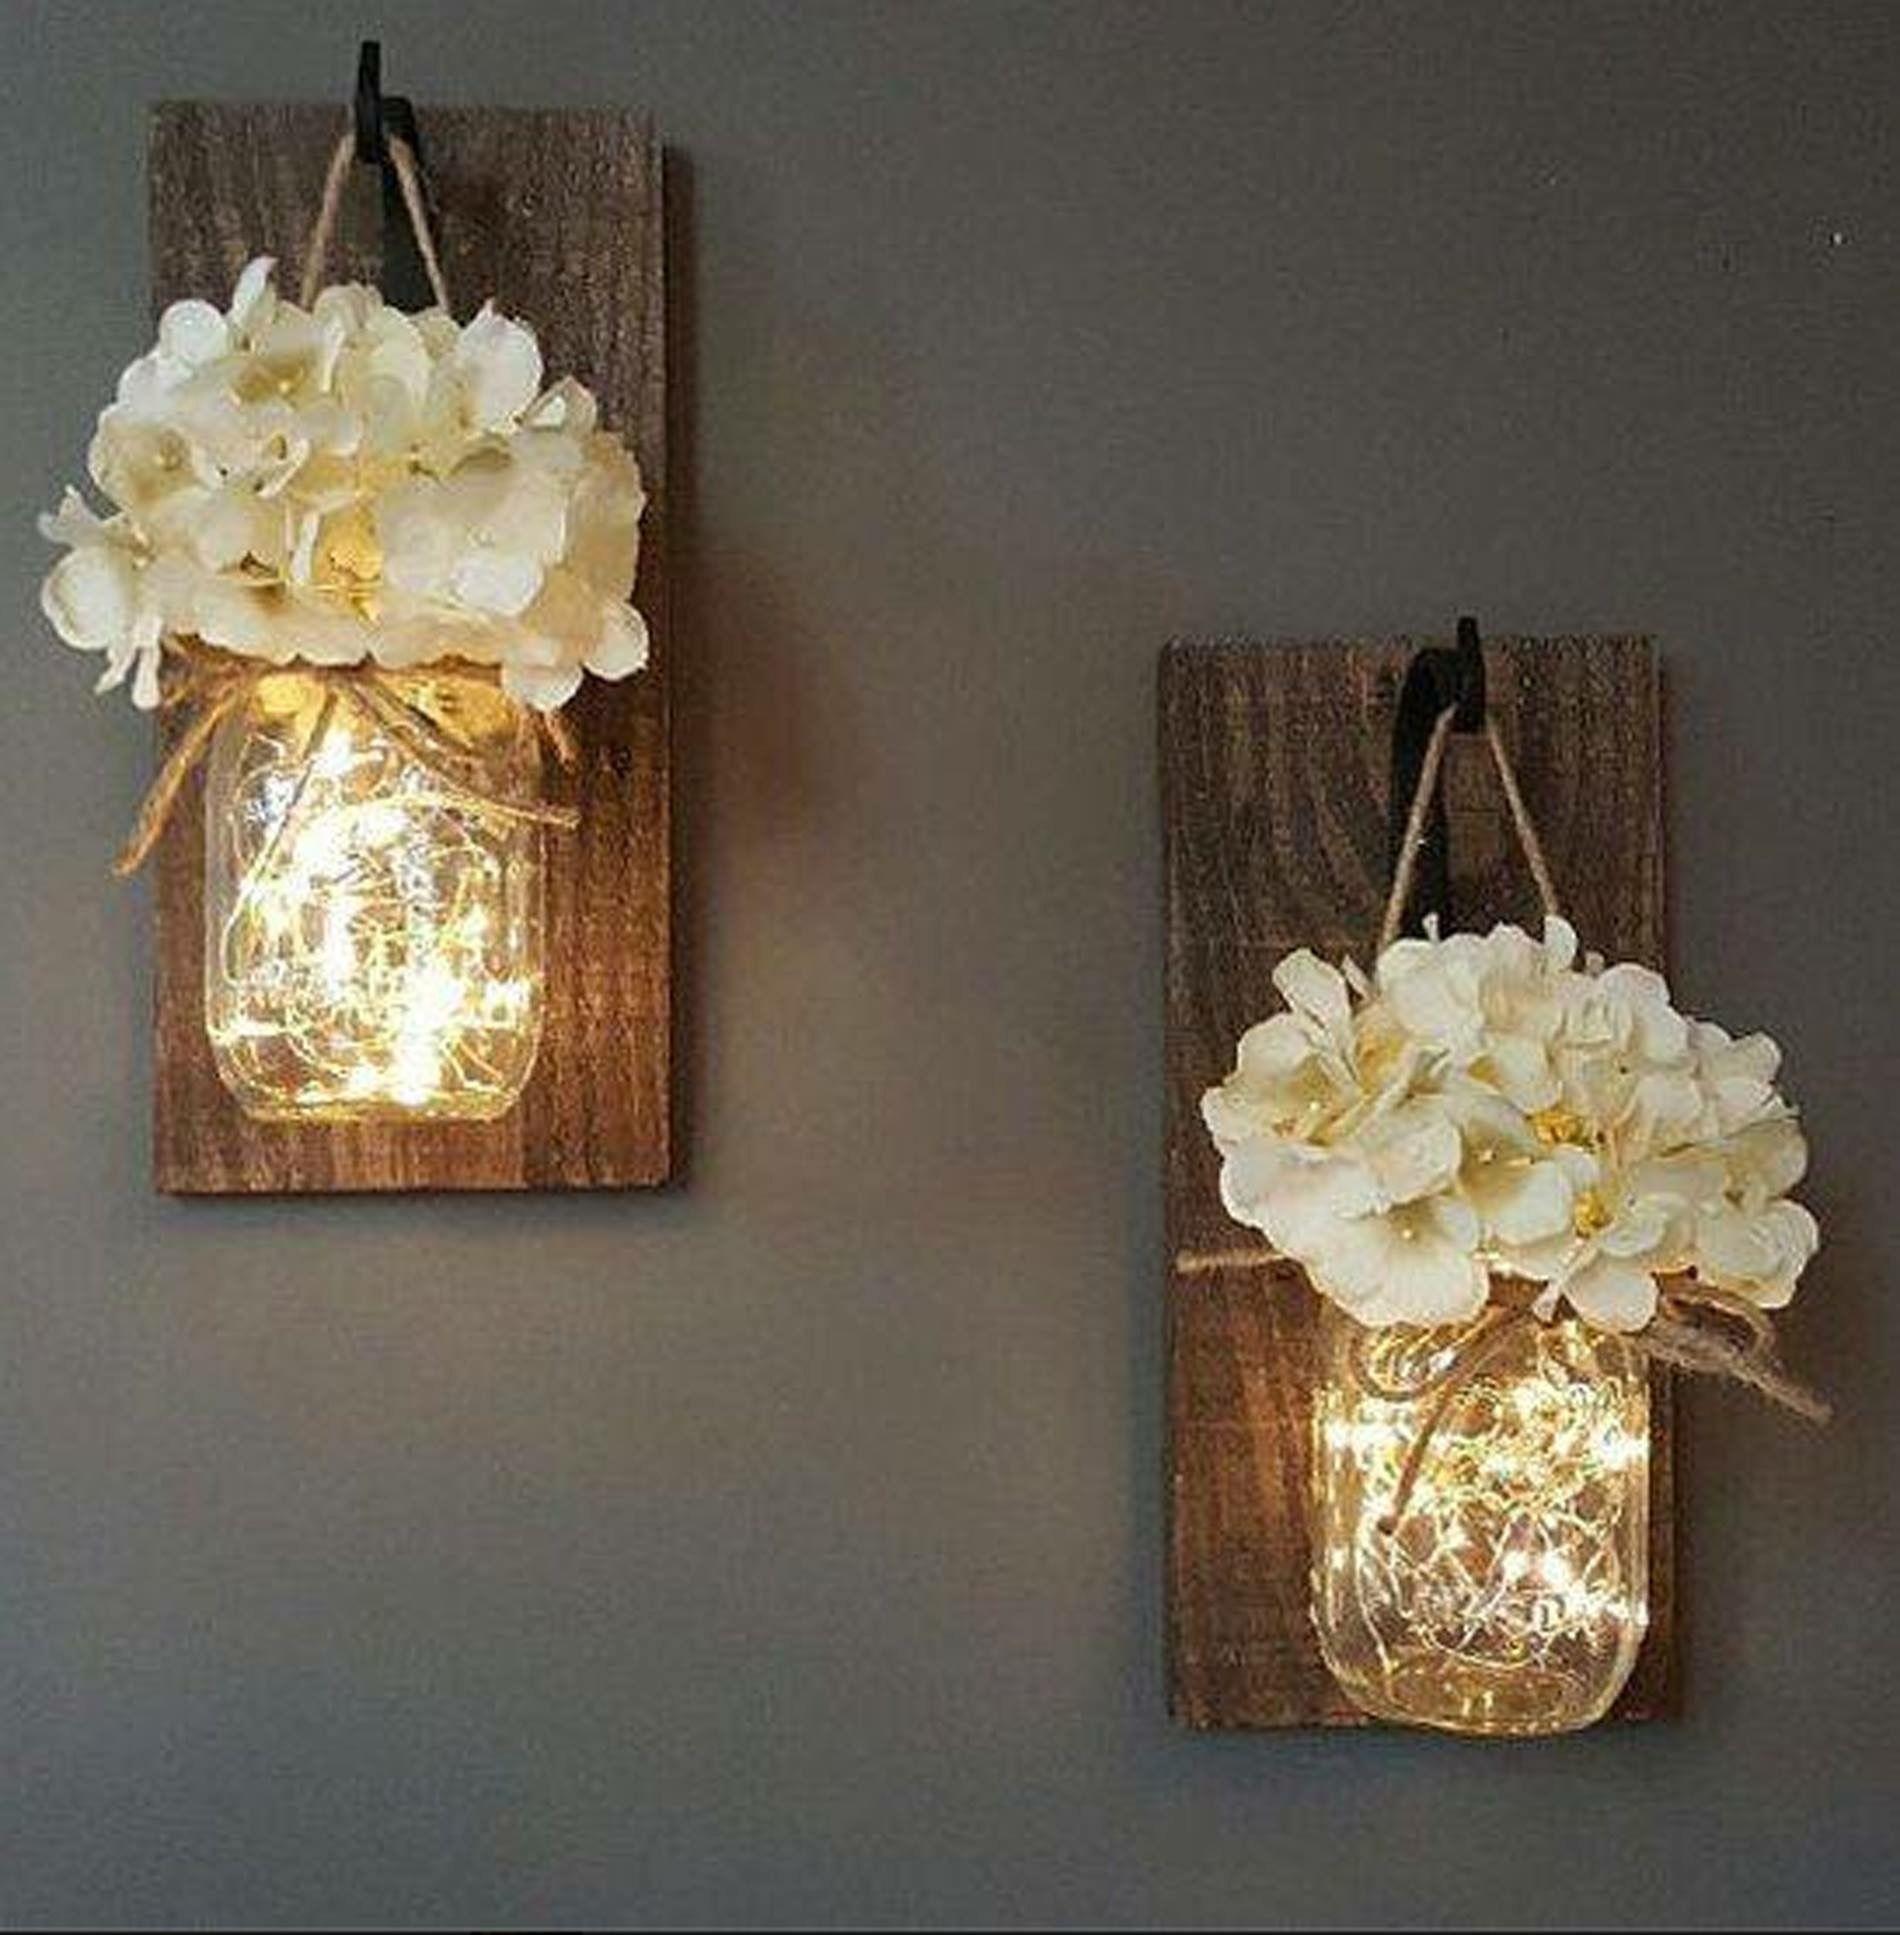 Diy wedding decor hanging lights rustic wood hanging for Diy rustic pendant light